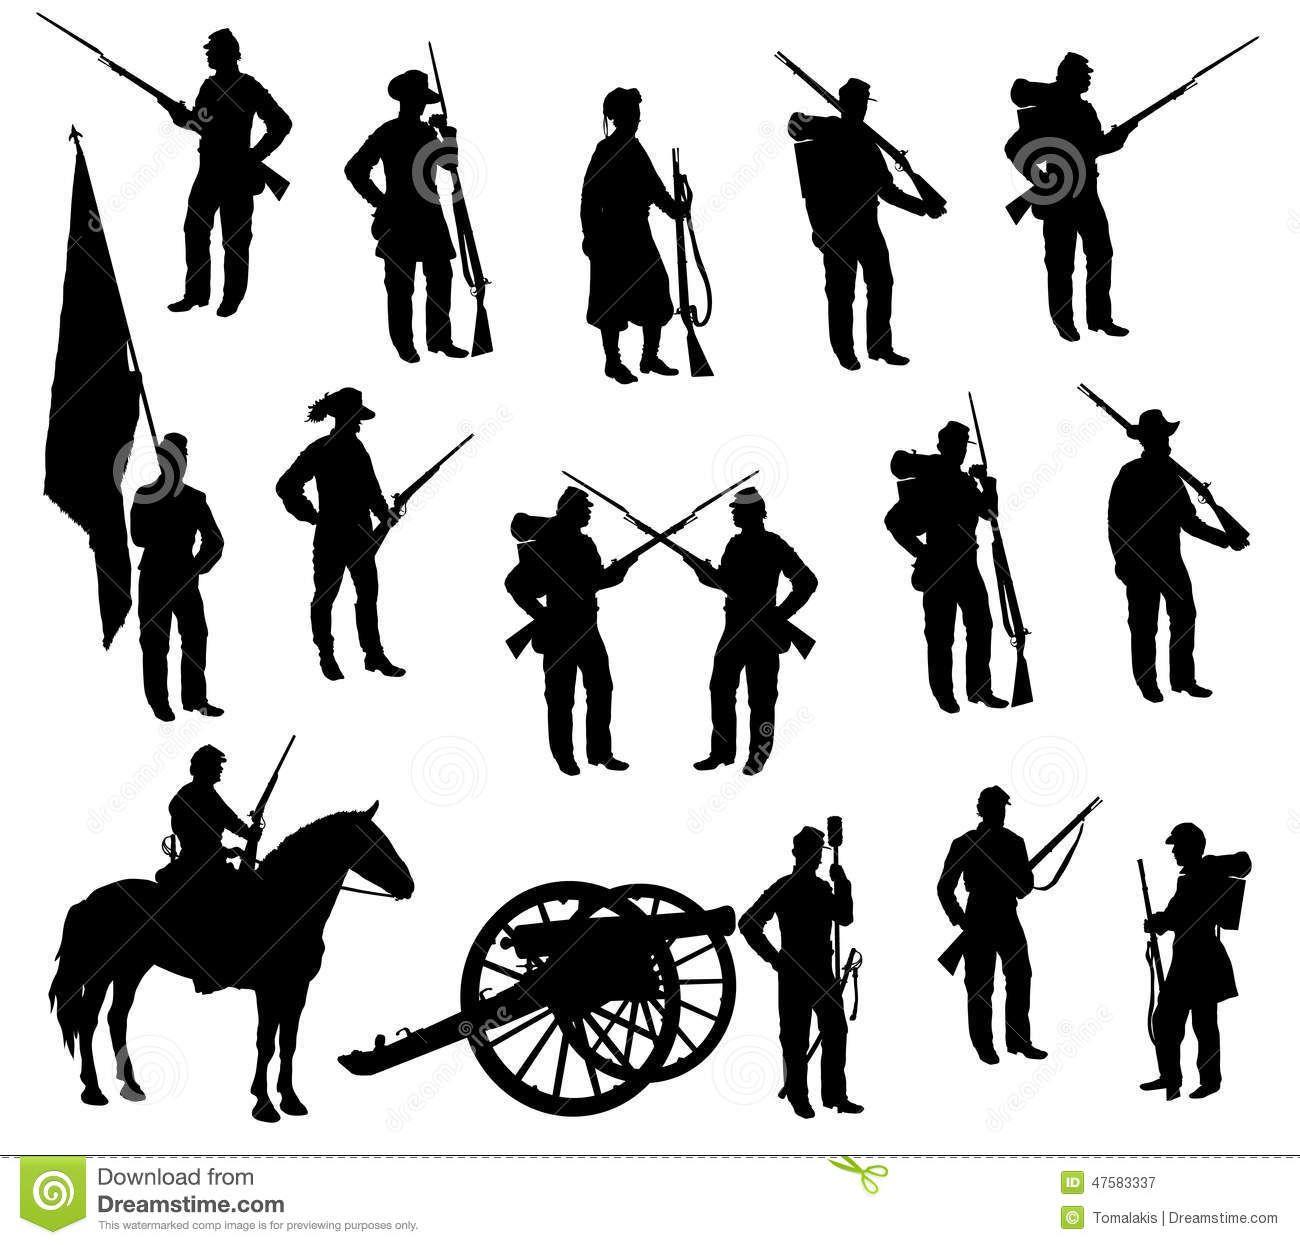 Soldiers clipart american civil war Rifles  of Silhouettes Civil